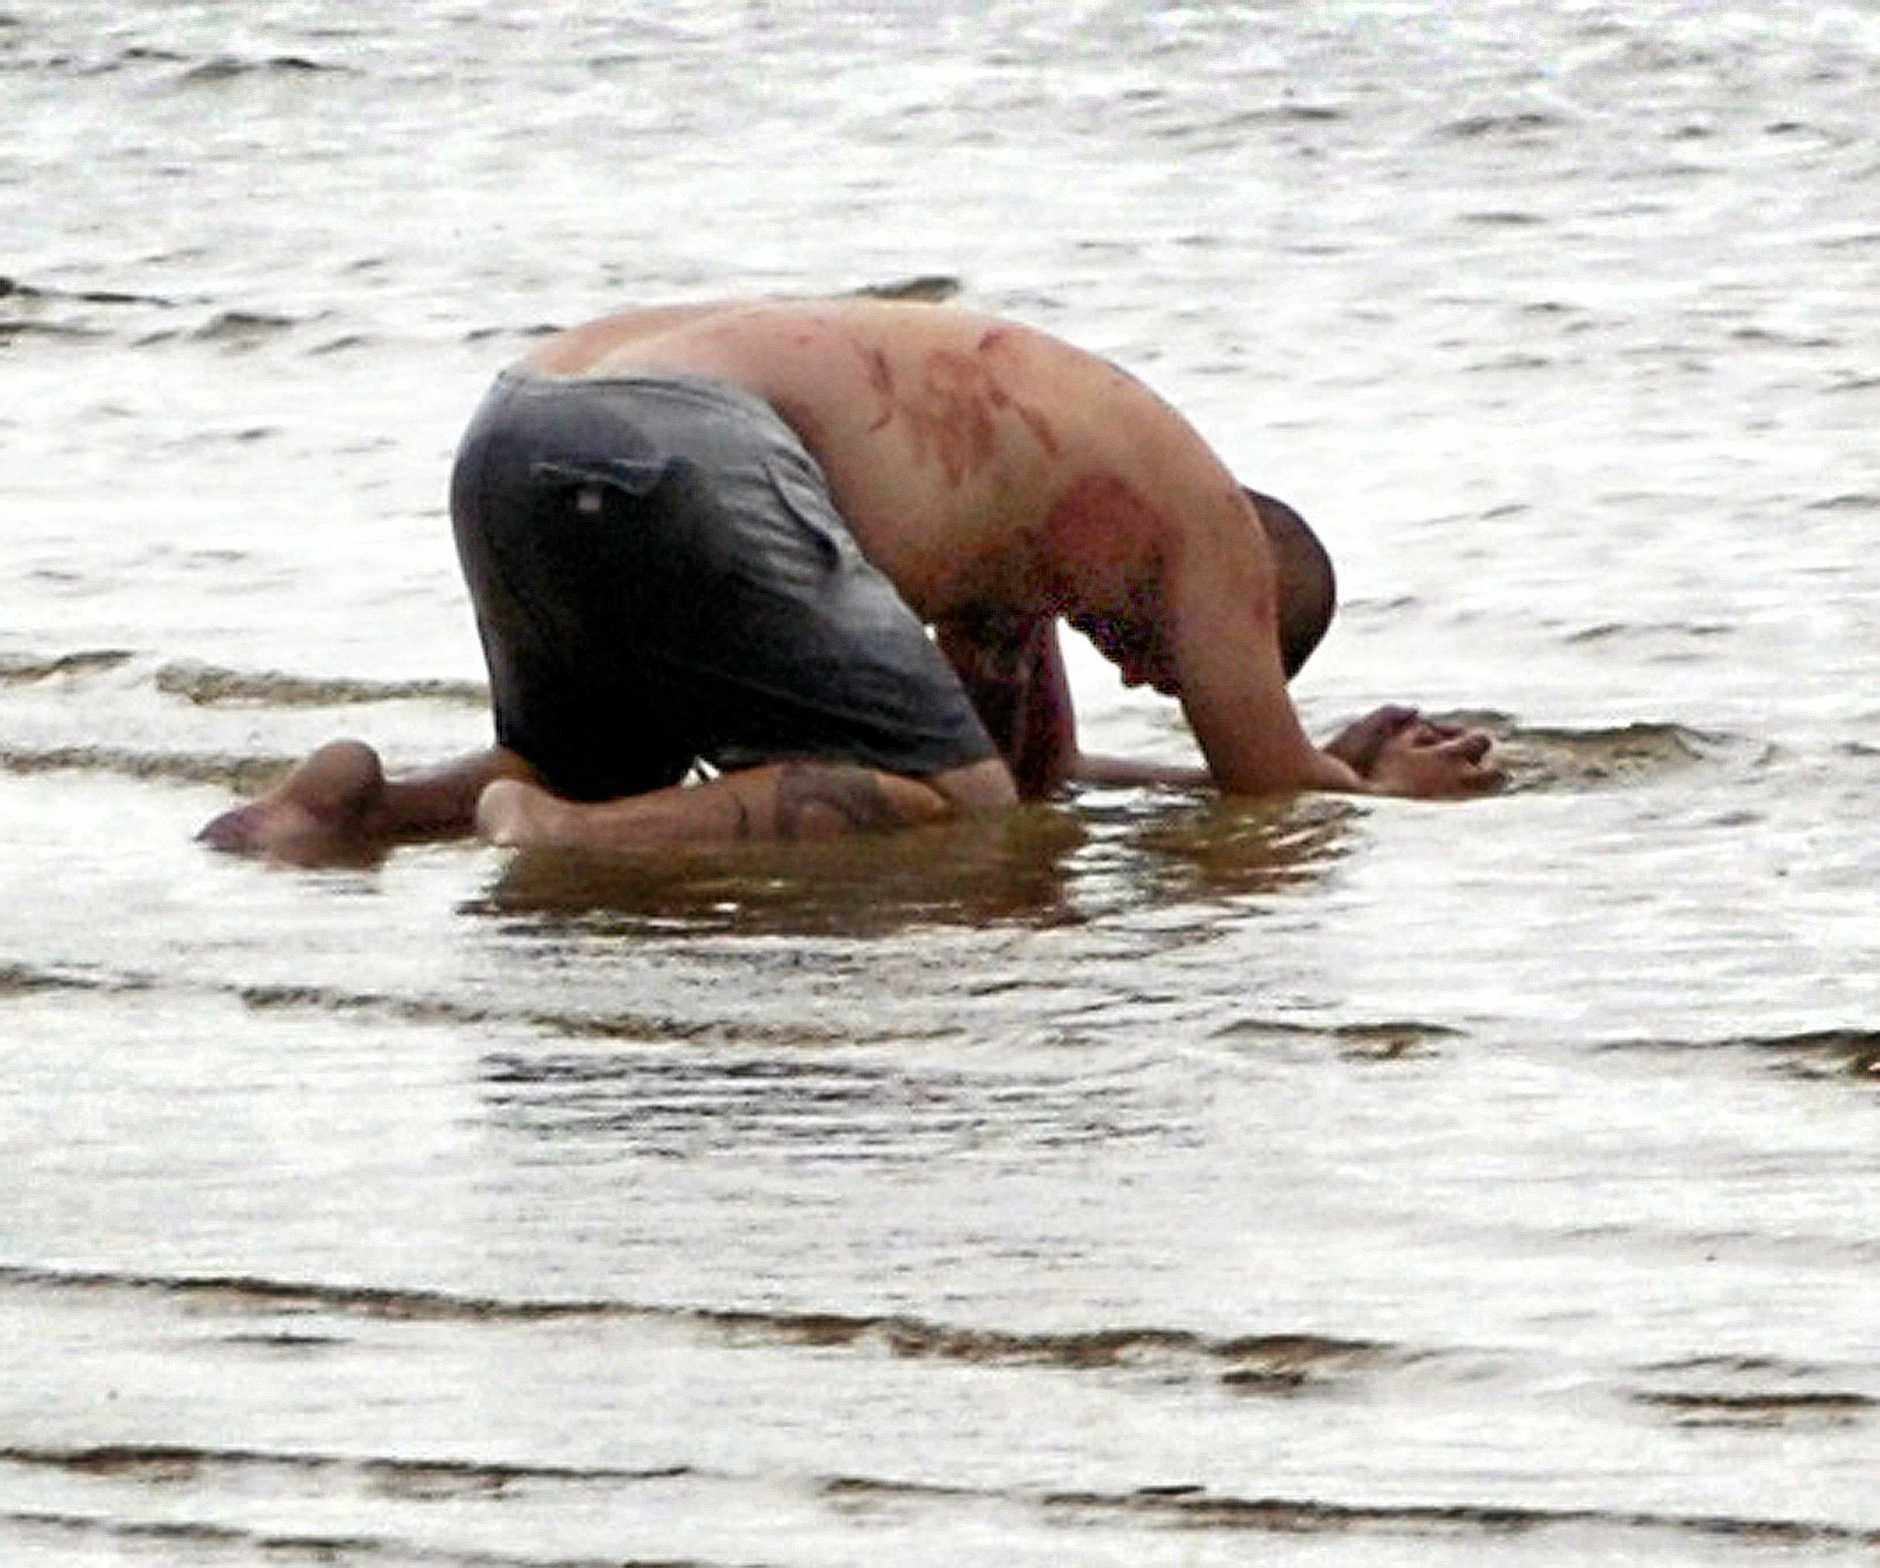 Double stabbing at Urangan - alleged attacker in the water at Urangan beach near marina rock wall.  Hervey Bay man Eric Heuer accused of butchering his housemates, at Urangan on November 18, 2008, has pleaded guilty.